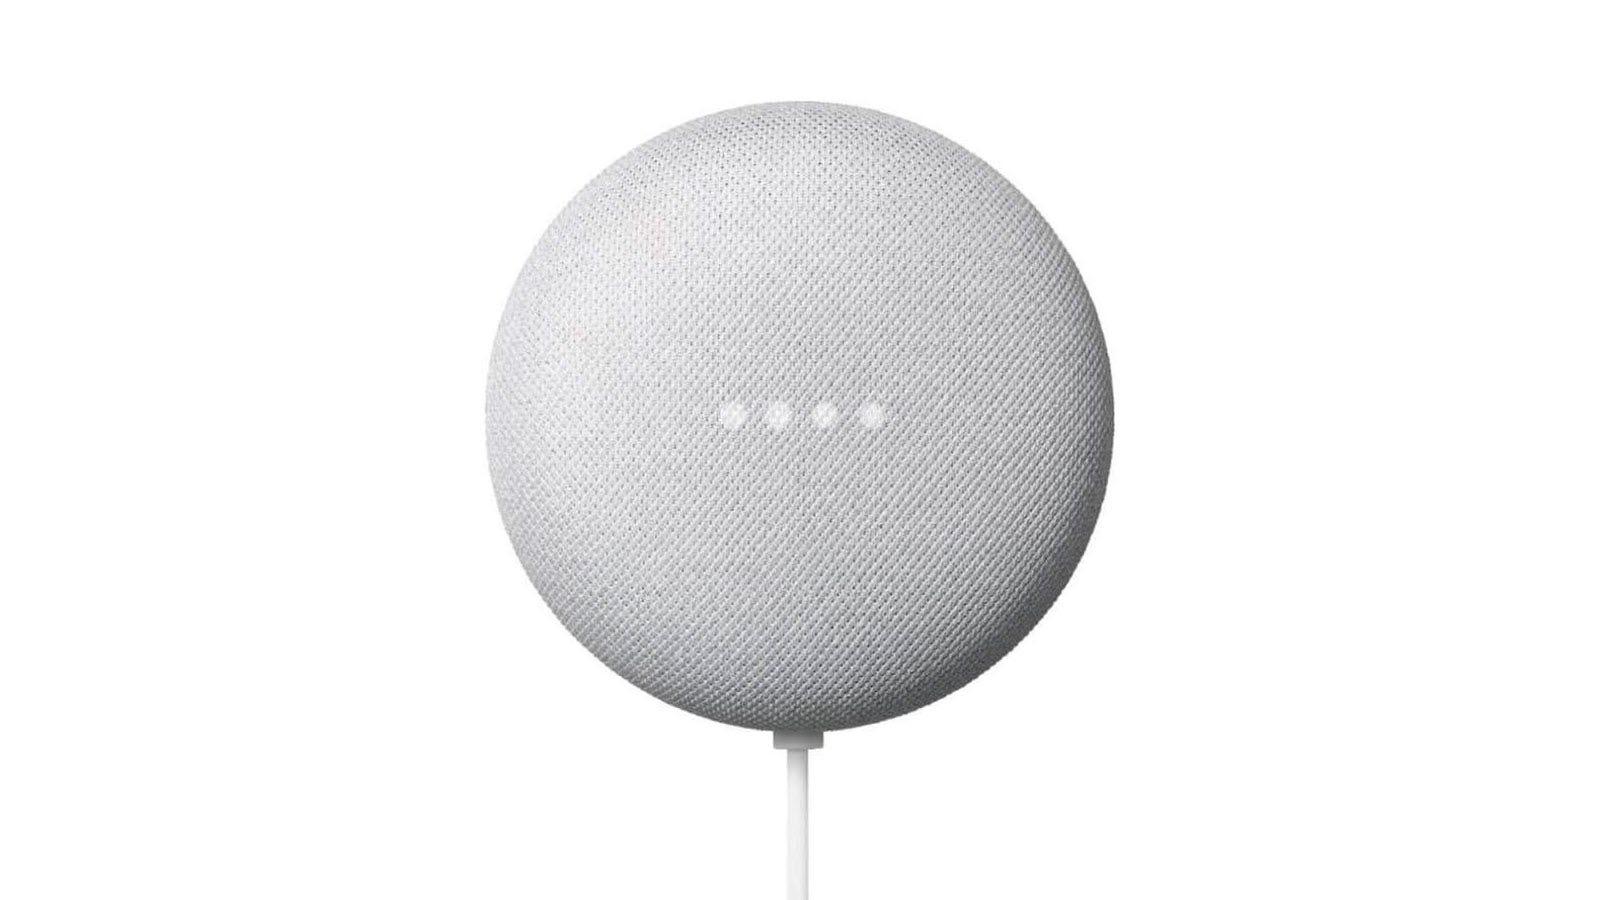 A white Google Nest Mini with four white LEDs.